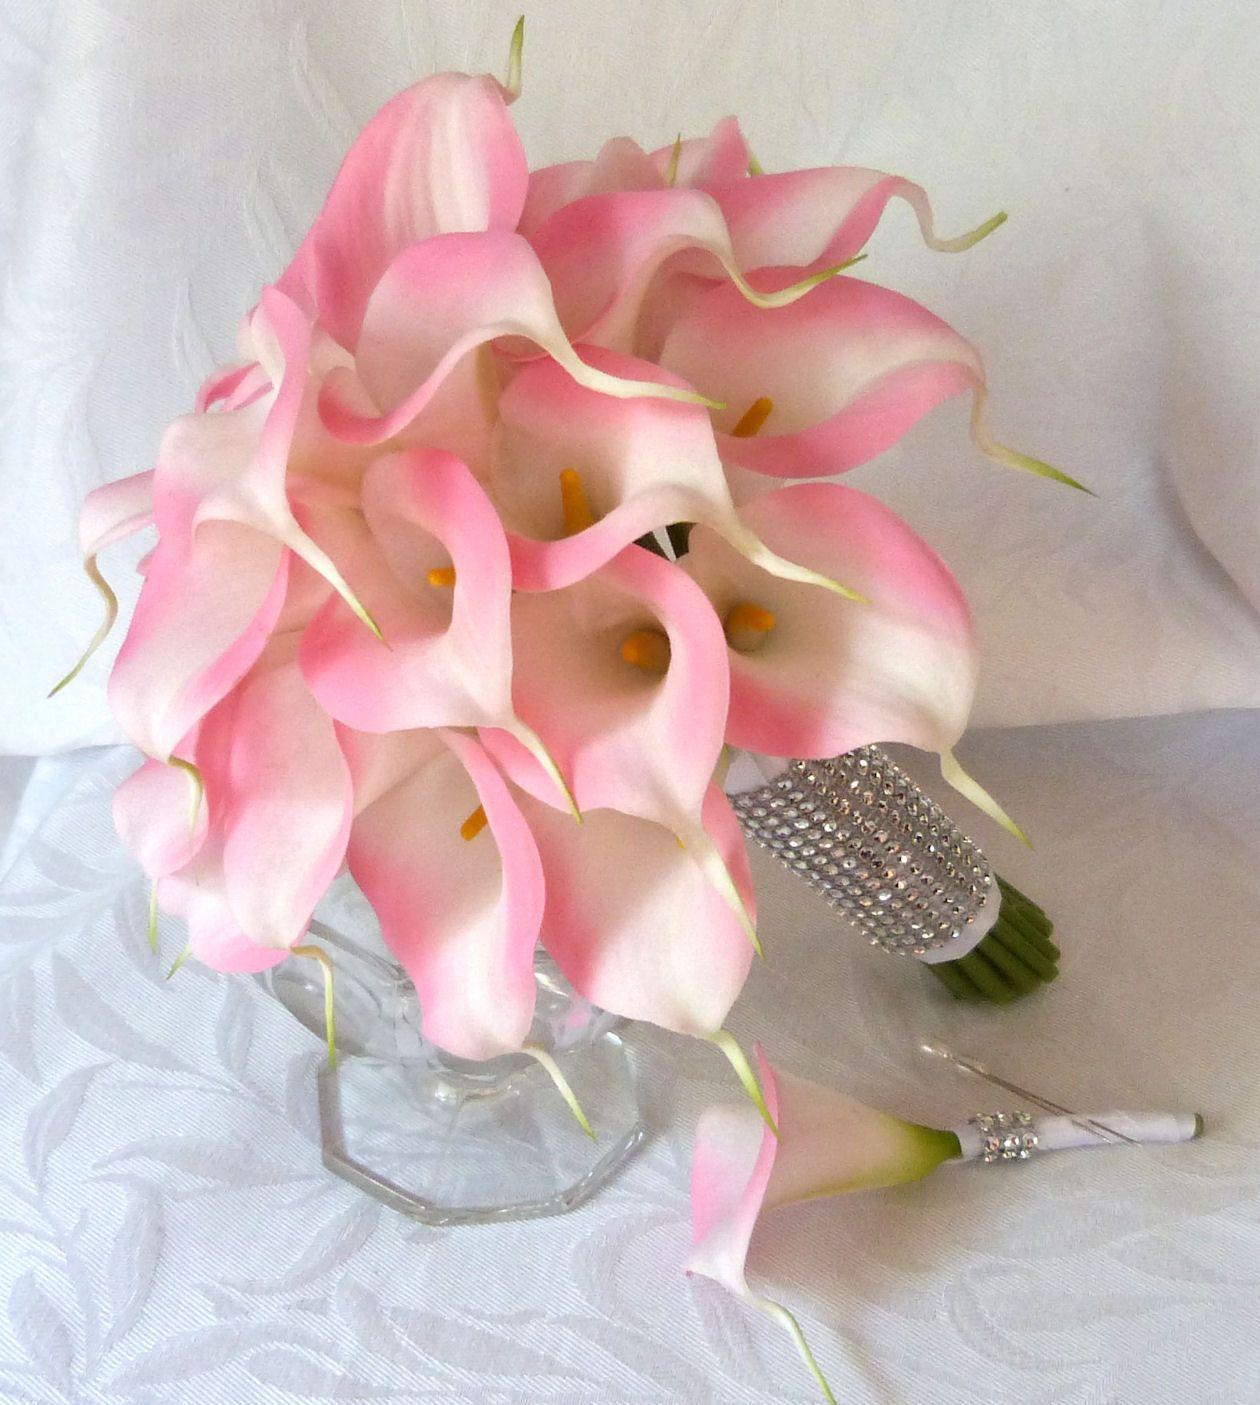 Pink calla lily wedding bouquet simple elegant real touch mini pink pink calla lily wedding bouquet simple elegant real touch mini pink calla lily bridal bouquet izmirmasajfo Choice Image